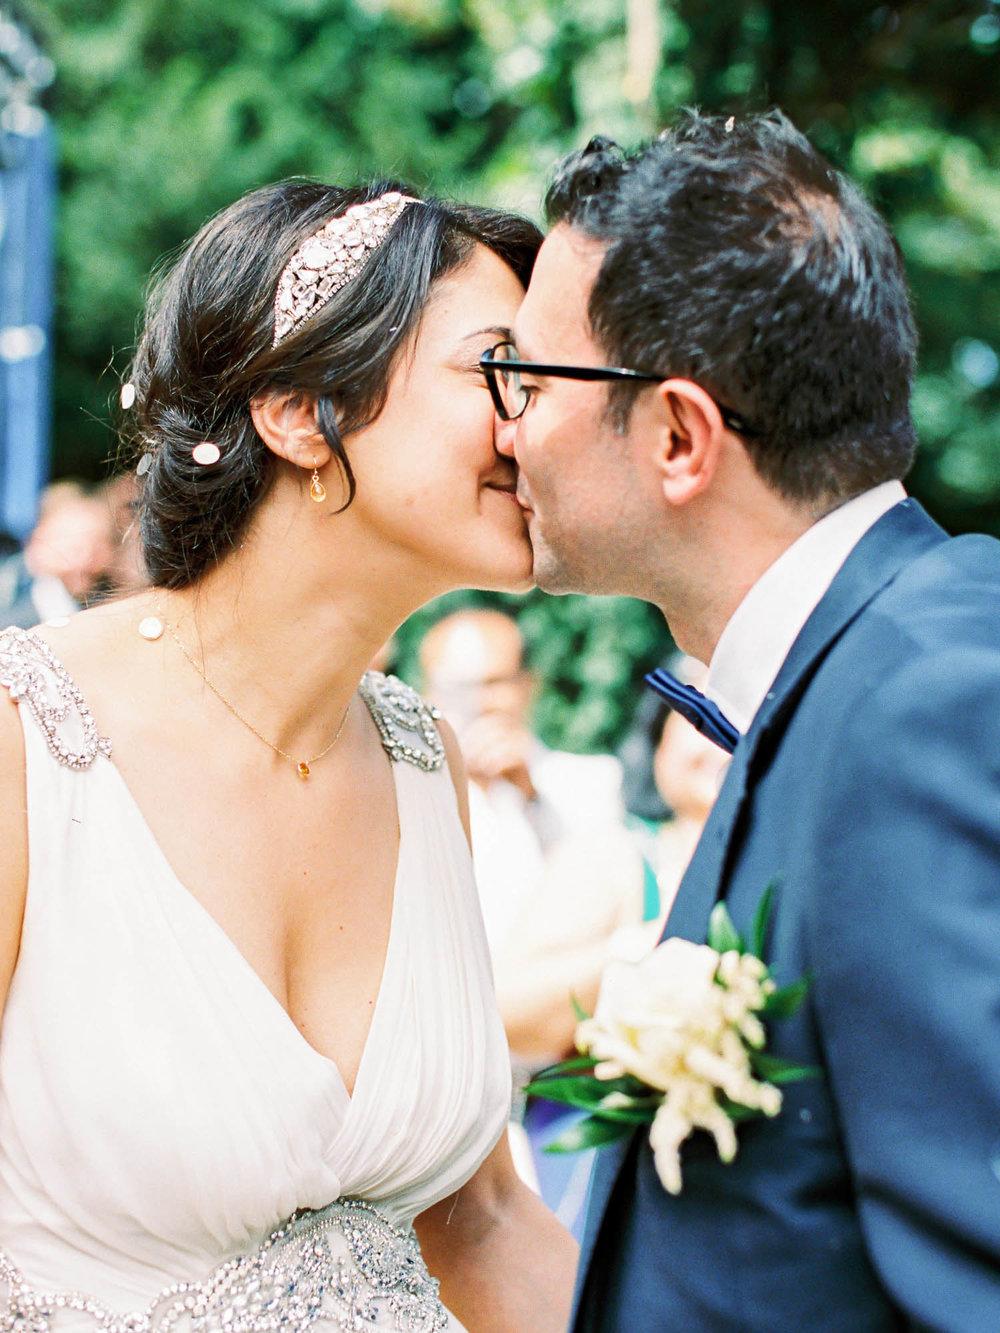 Amy O'Boyle Photography- Destination & UK Fine Art Film Wedding Photographer- Brickendonbury Estate Wedding-17.jpg